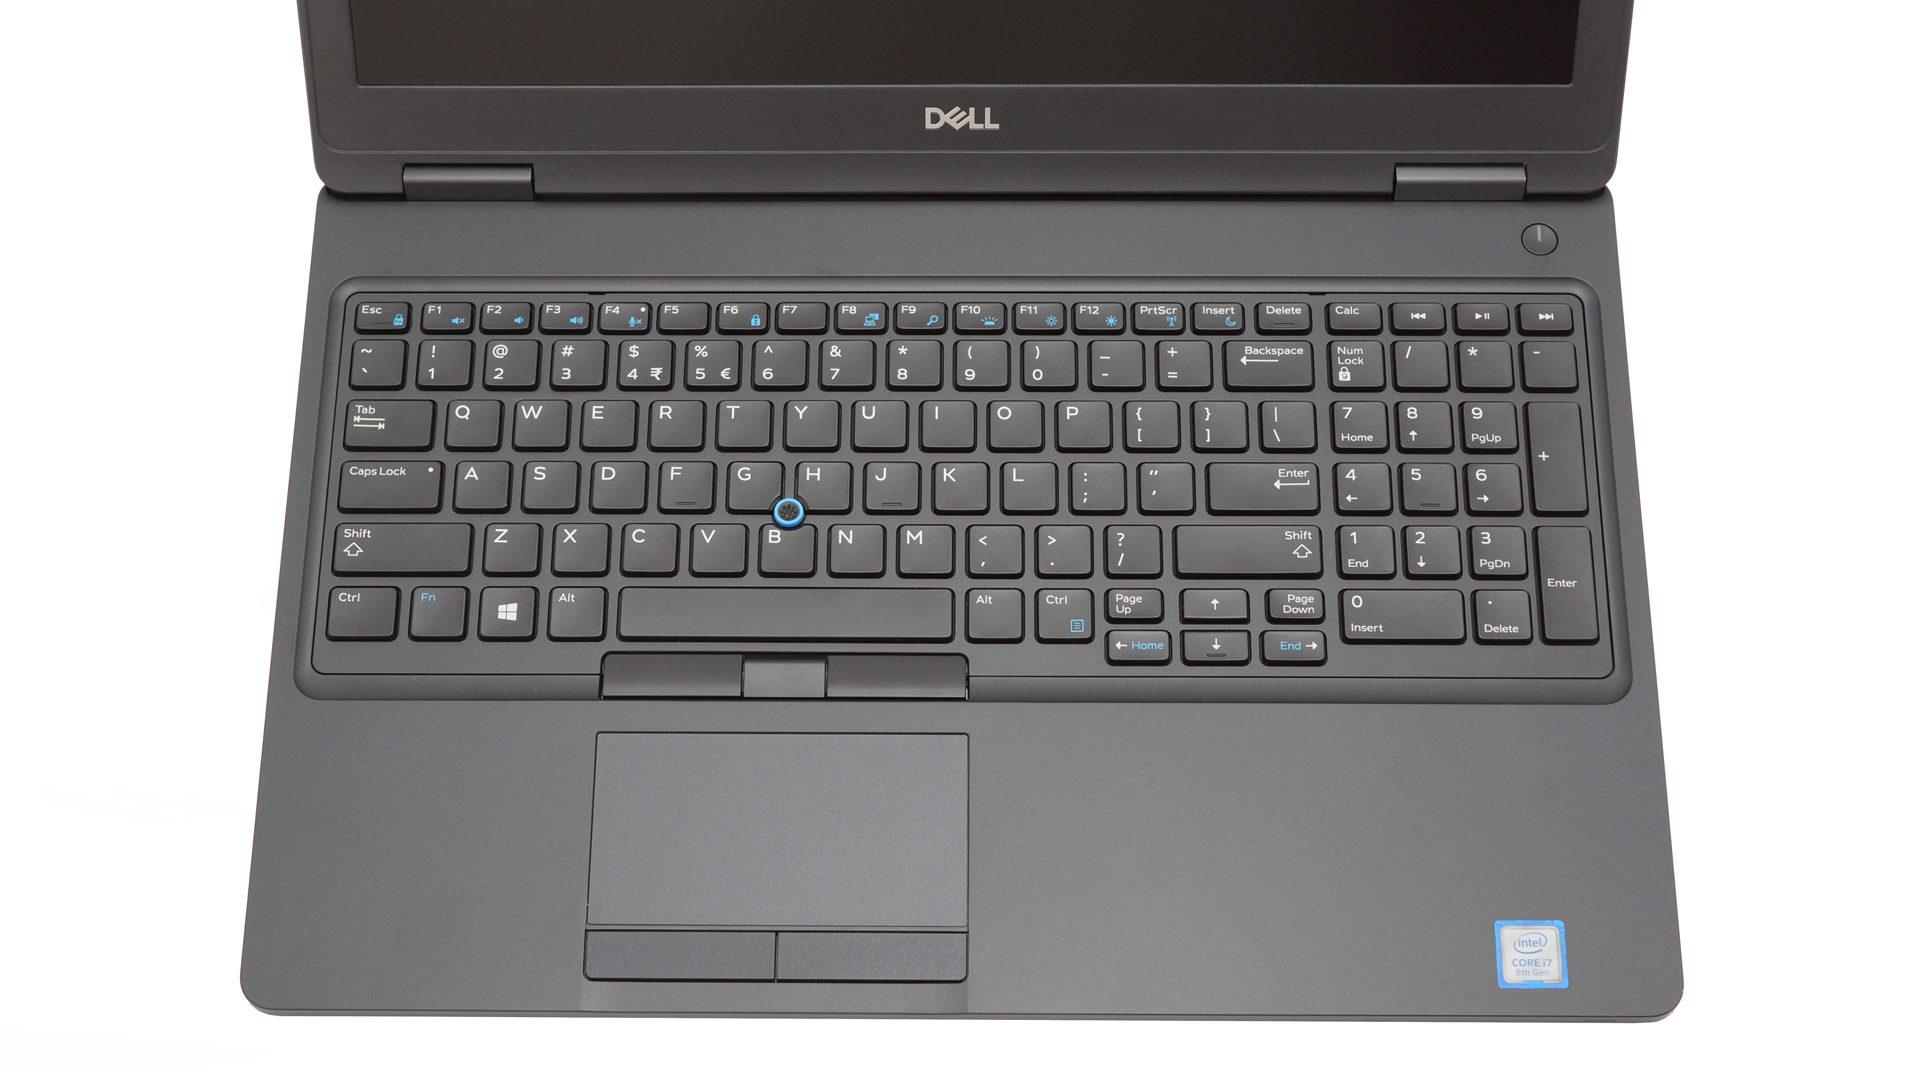 Dell Latitude 15 5590 review – the new Core i7-8650U in a